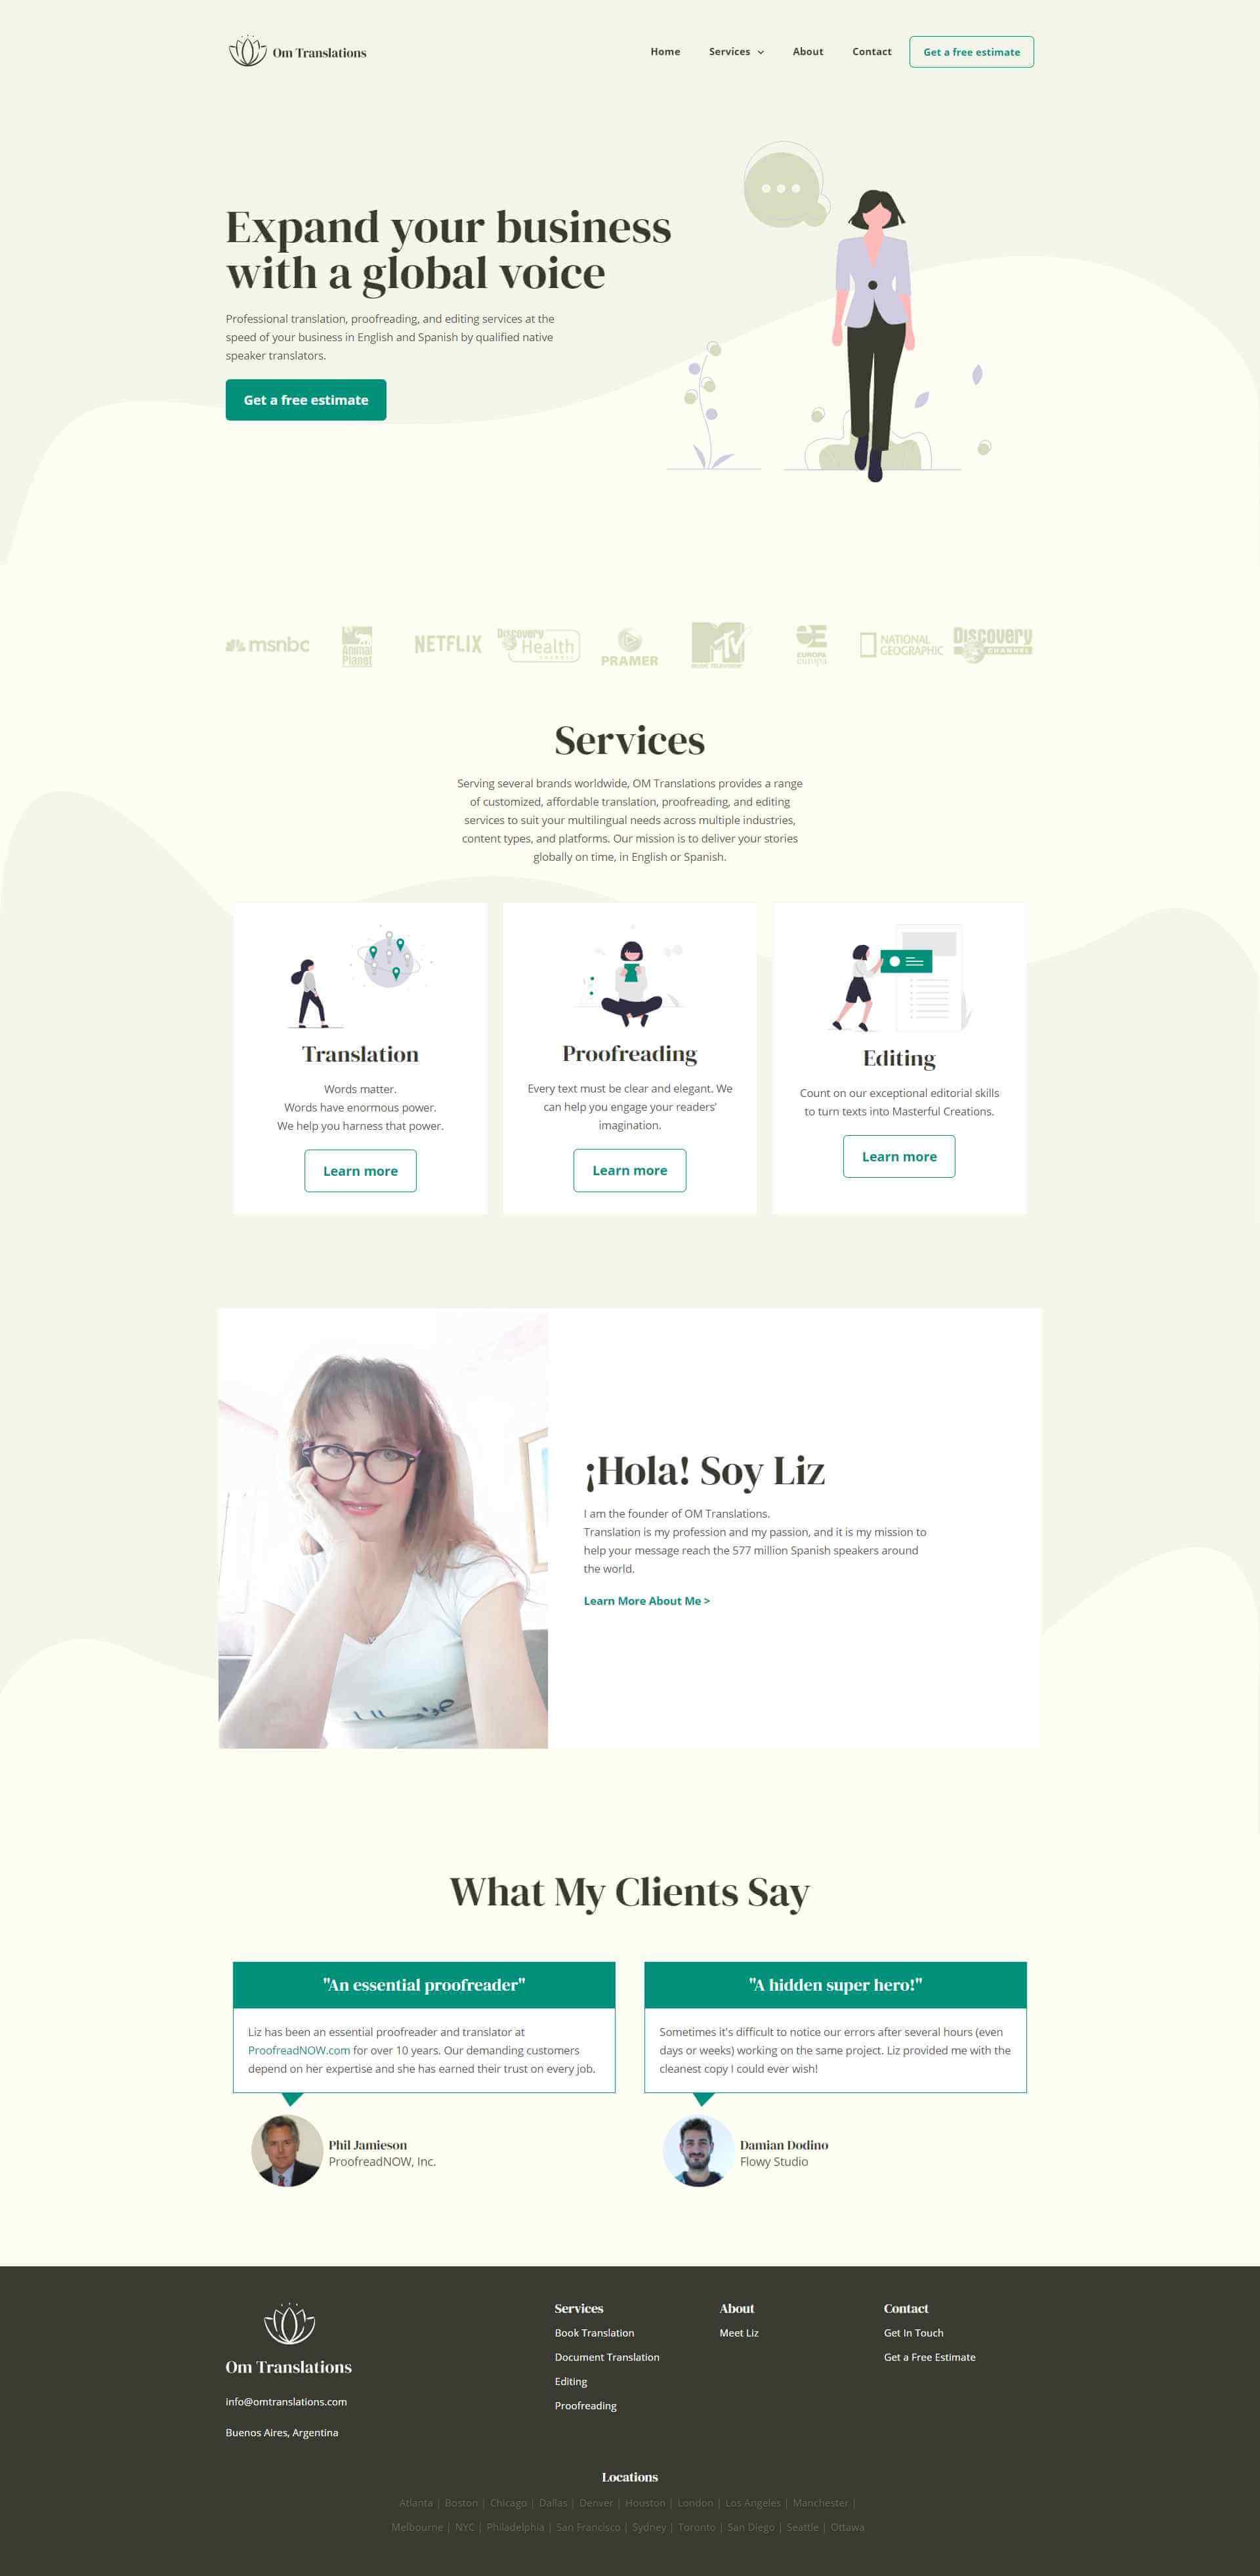 Web design for OM Translations by Flowy Studio